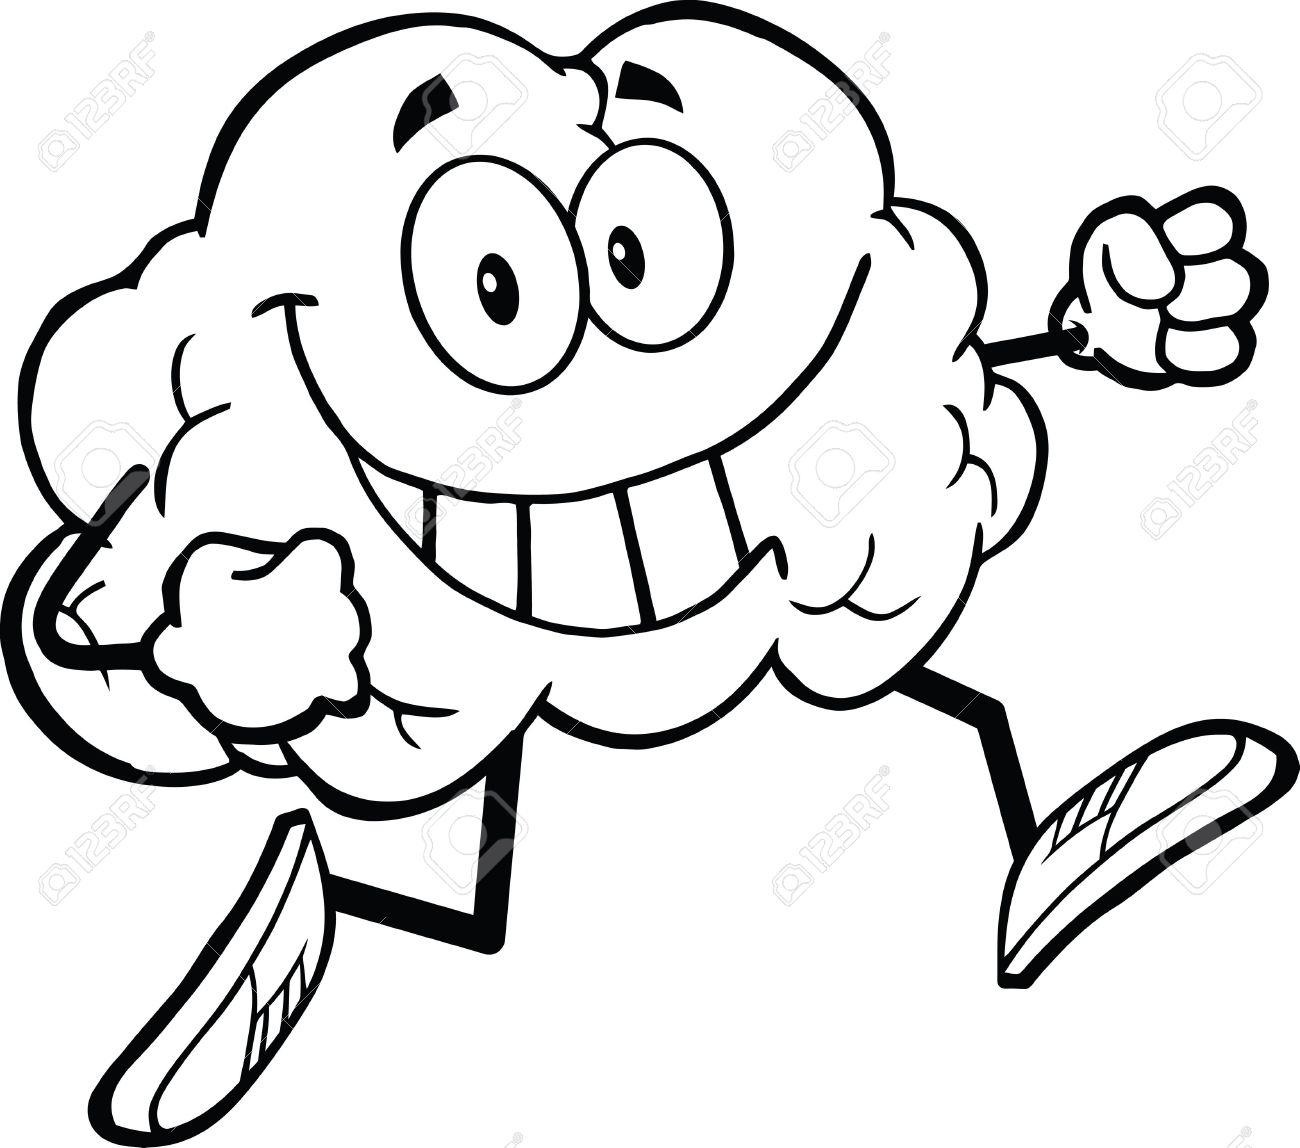 1300x1148 Cartoon Brain Drawing Cartoon Brain Drawing Outlined Healthy Brain